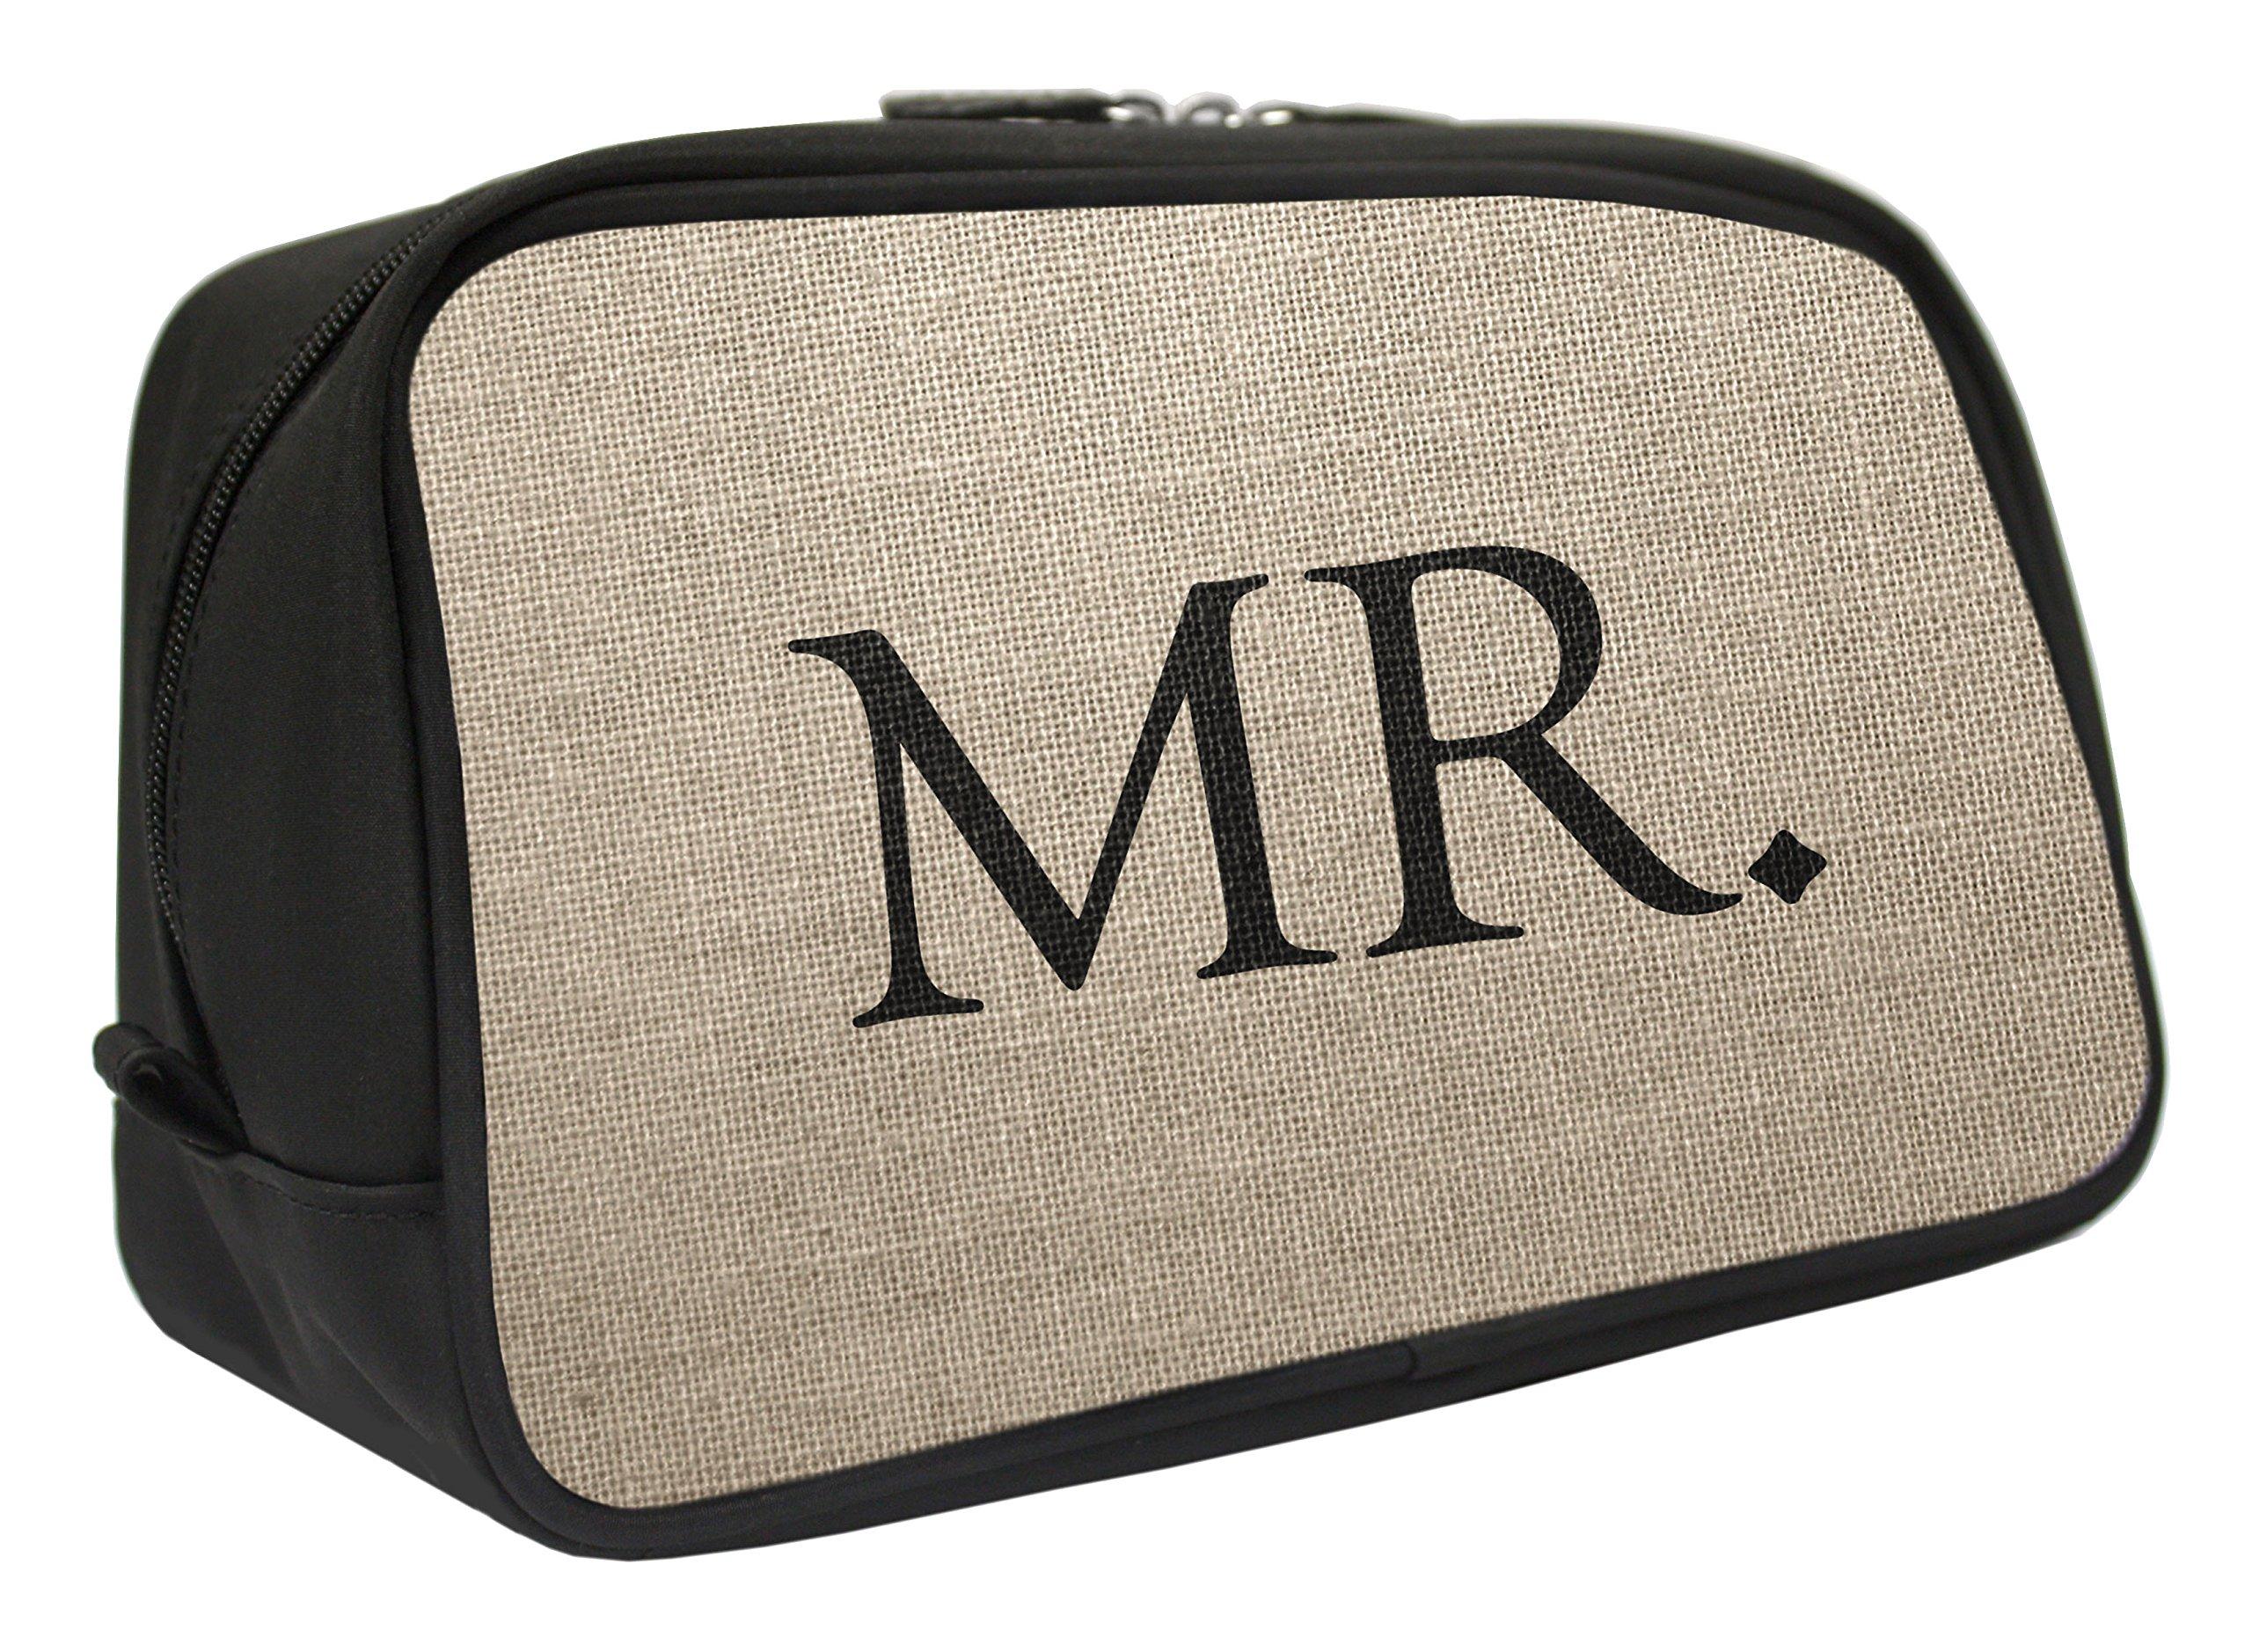 Snaptotes Mr. Wedding Groom Travel Toiletry Bag Shaving Dopp Kit